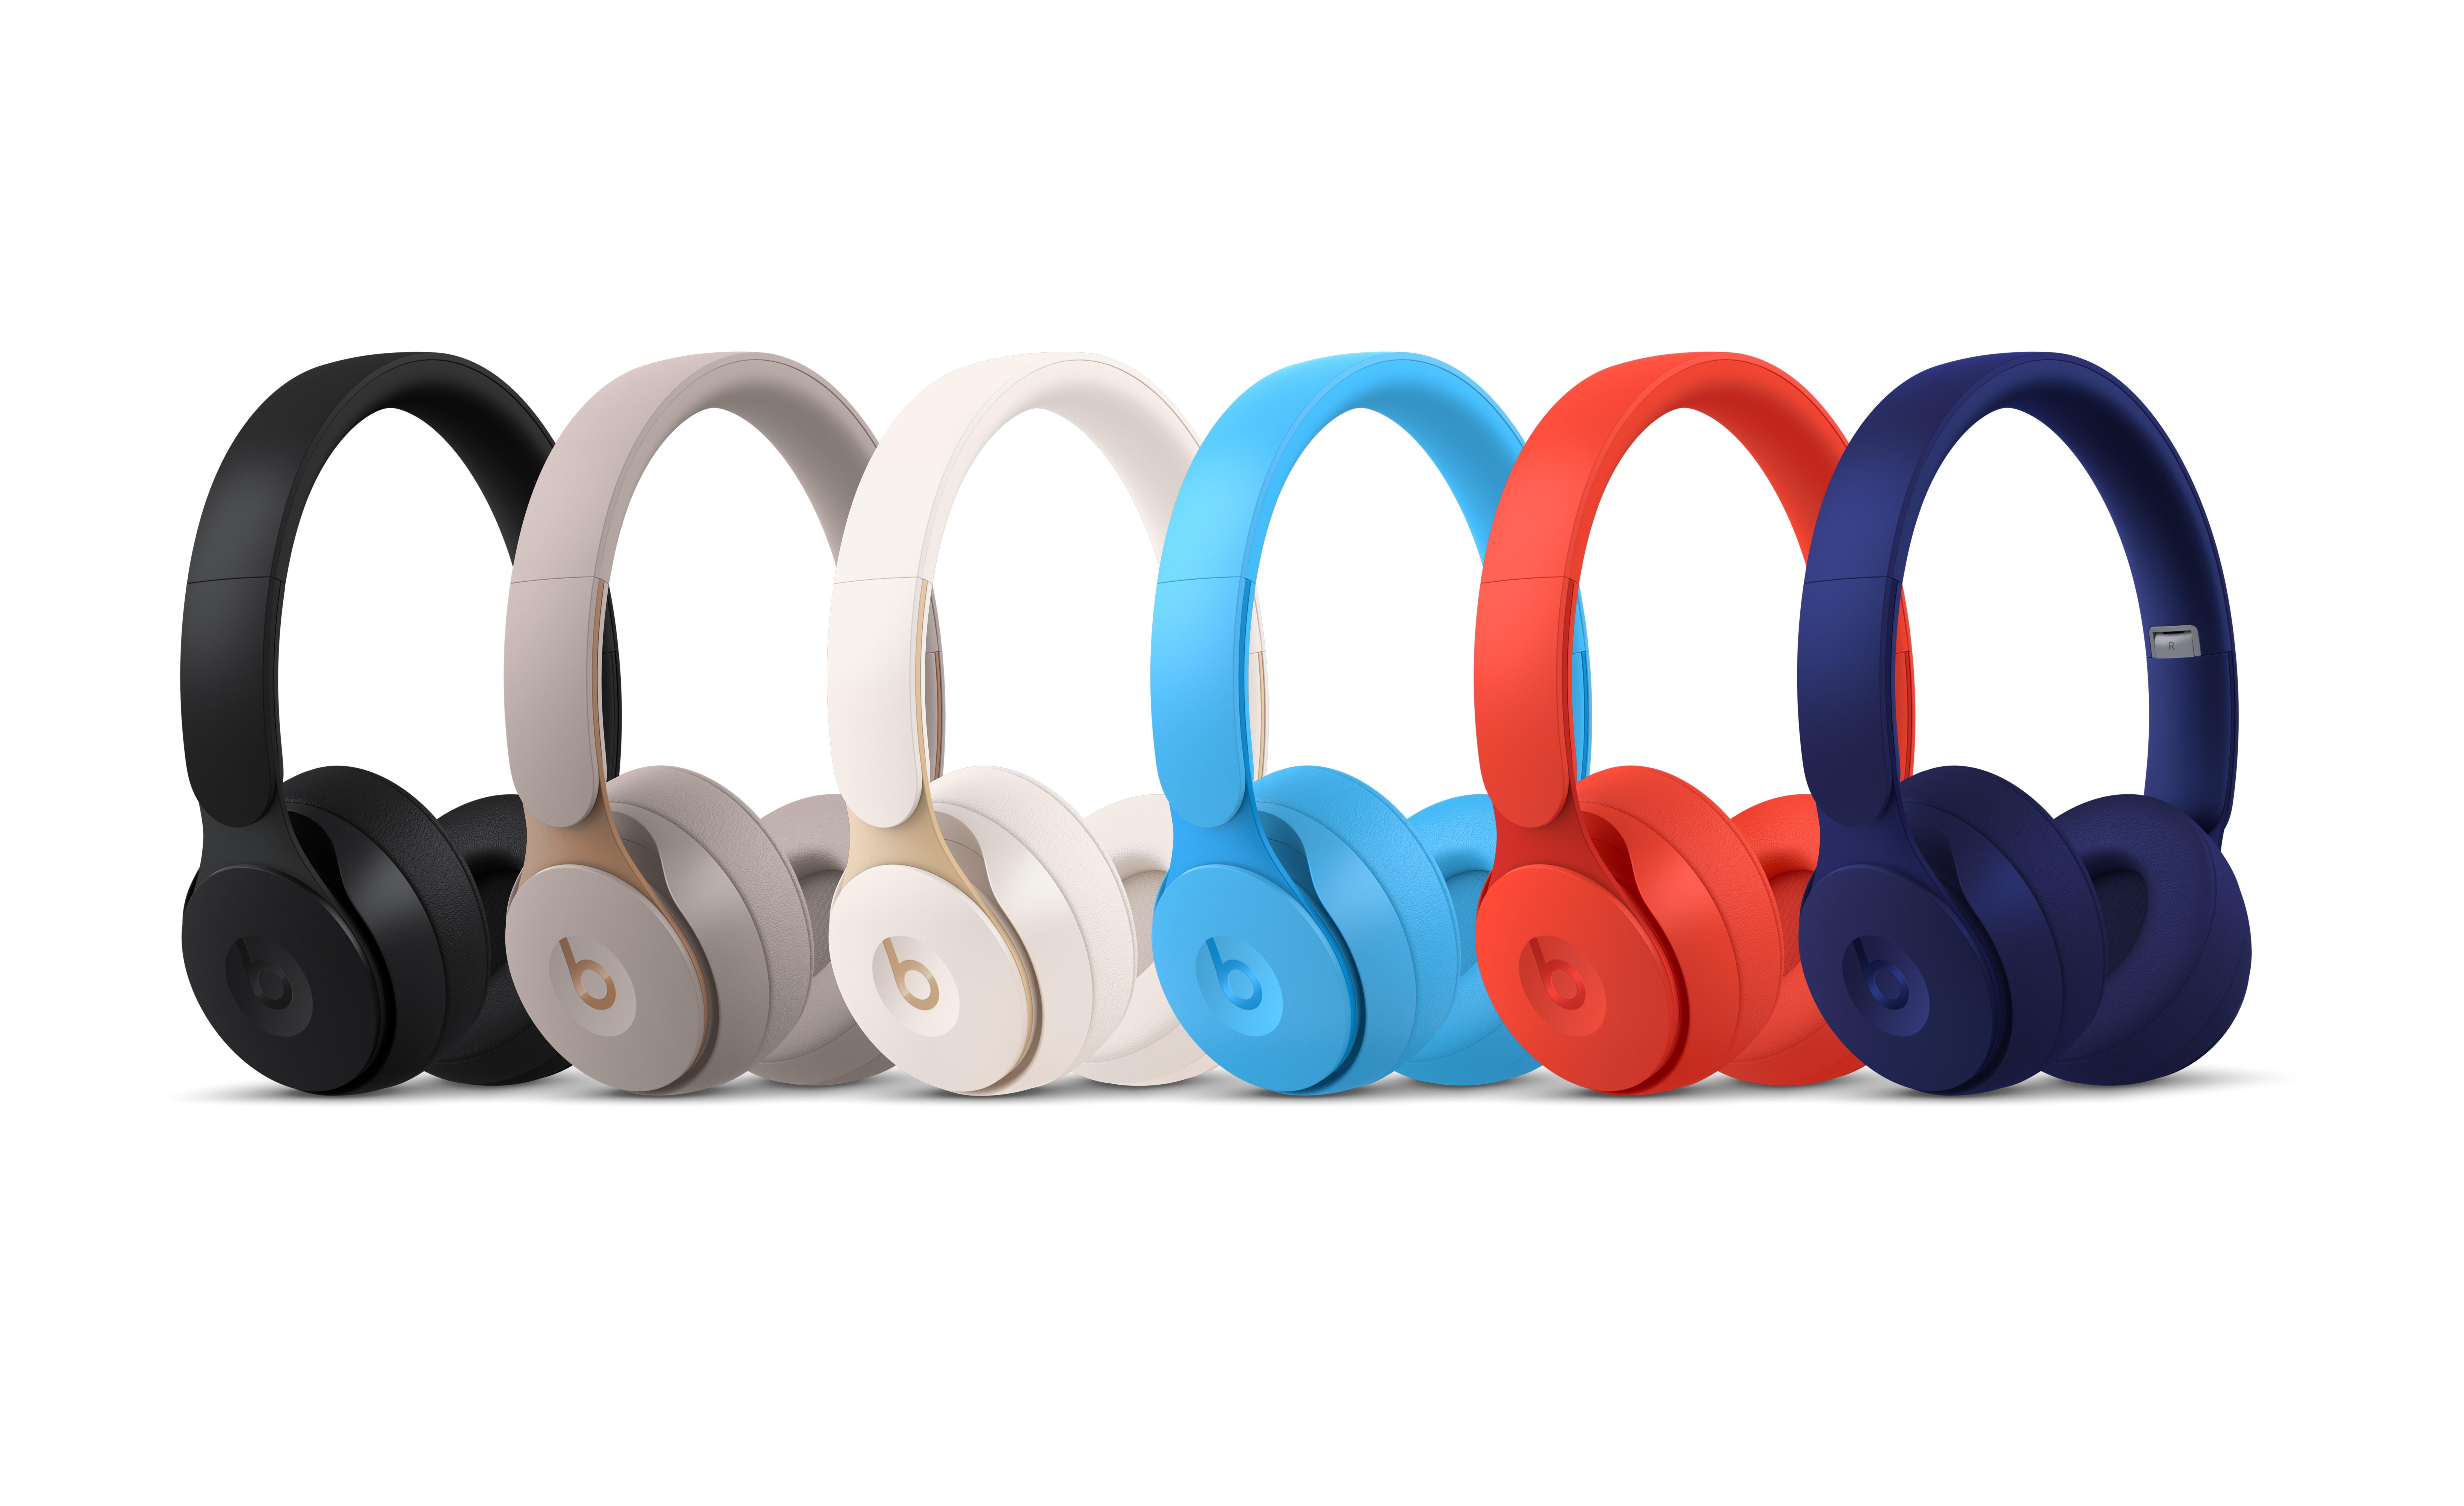 Apple Announces Beats Solo Pro On Ear Noise Canceling Wireless Headphones Betanews